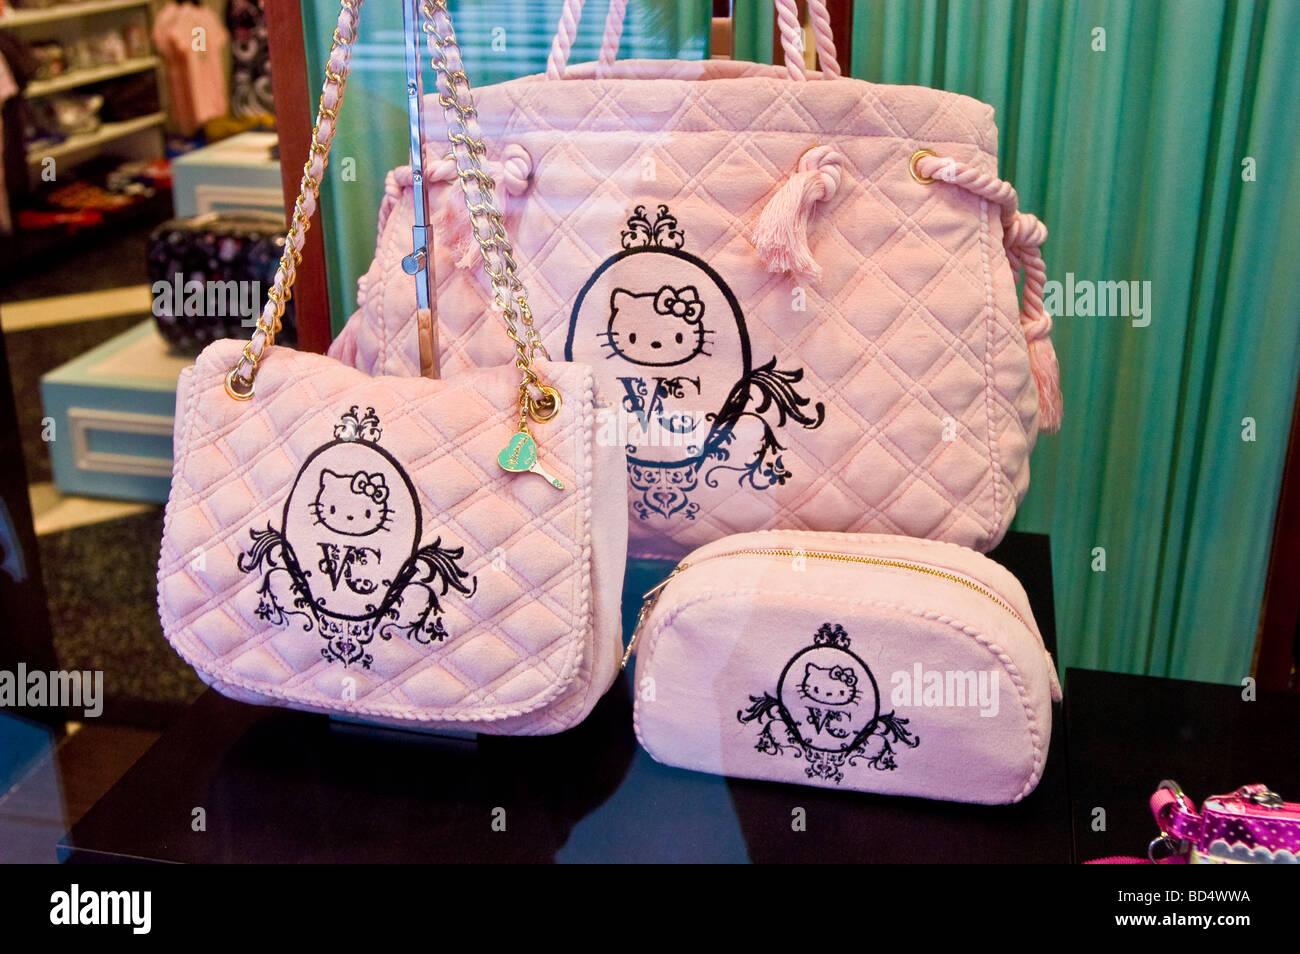 94422f85b Hello Kitty pink purses at Sanrio shop exhibition, 42nd Street, Manhattan,  New York, USA